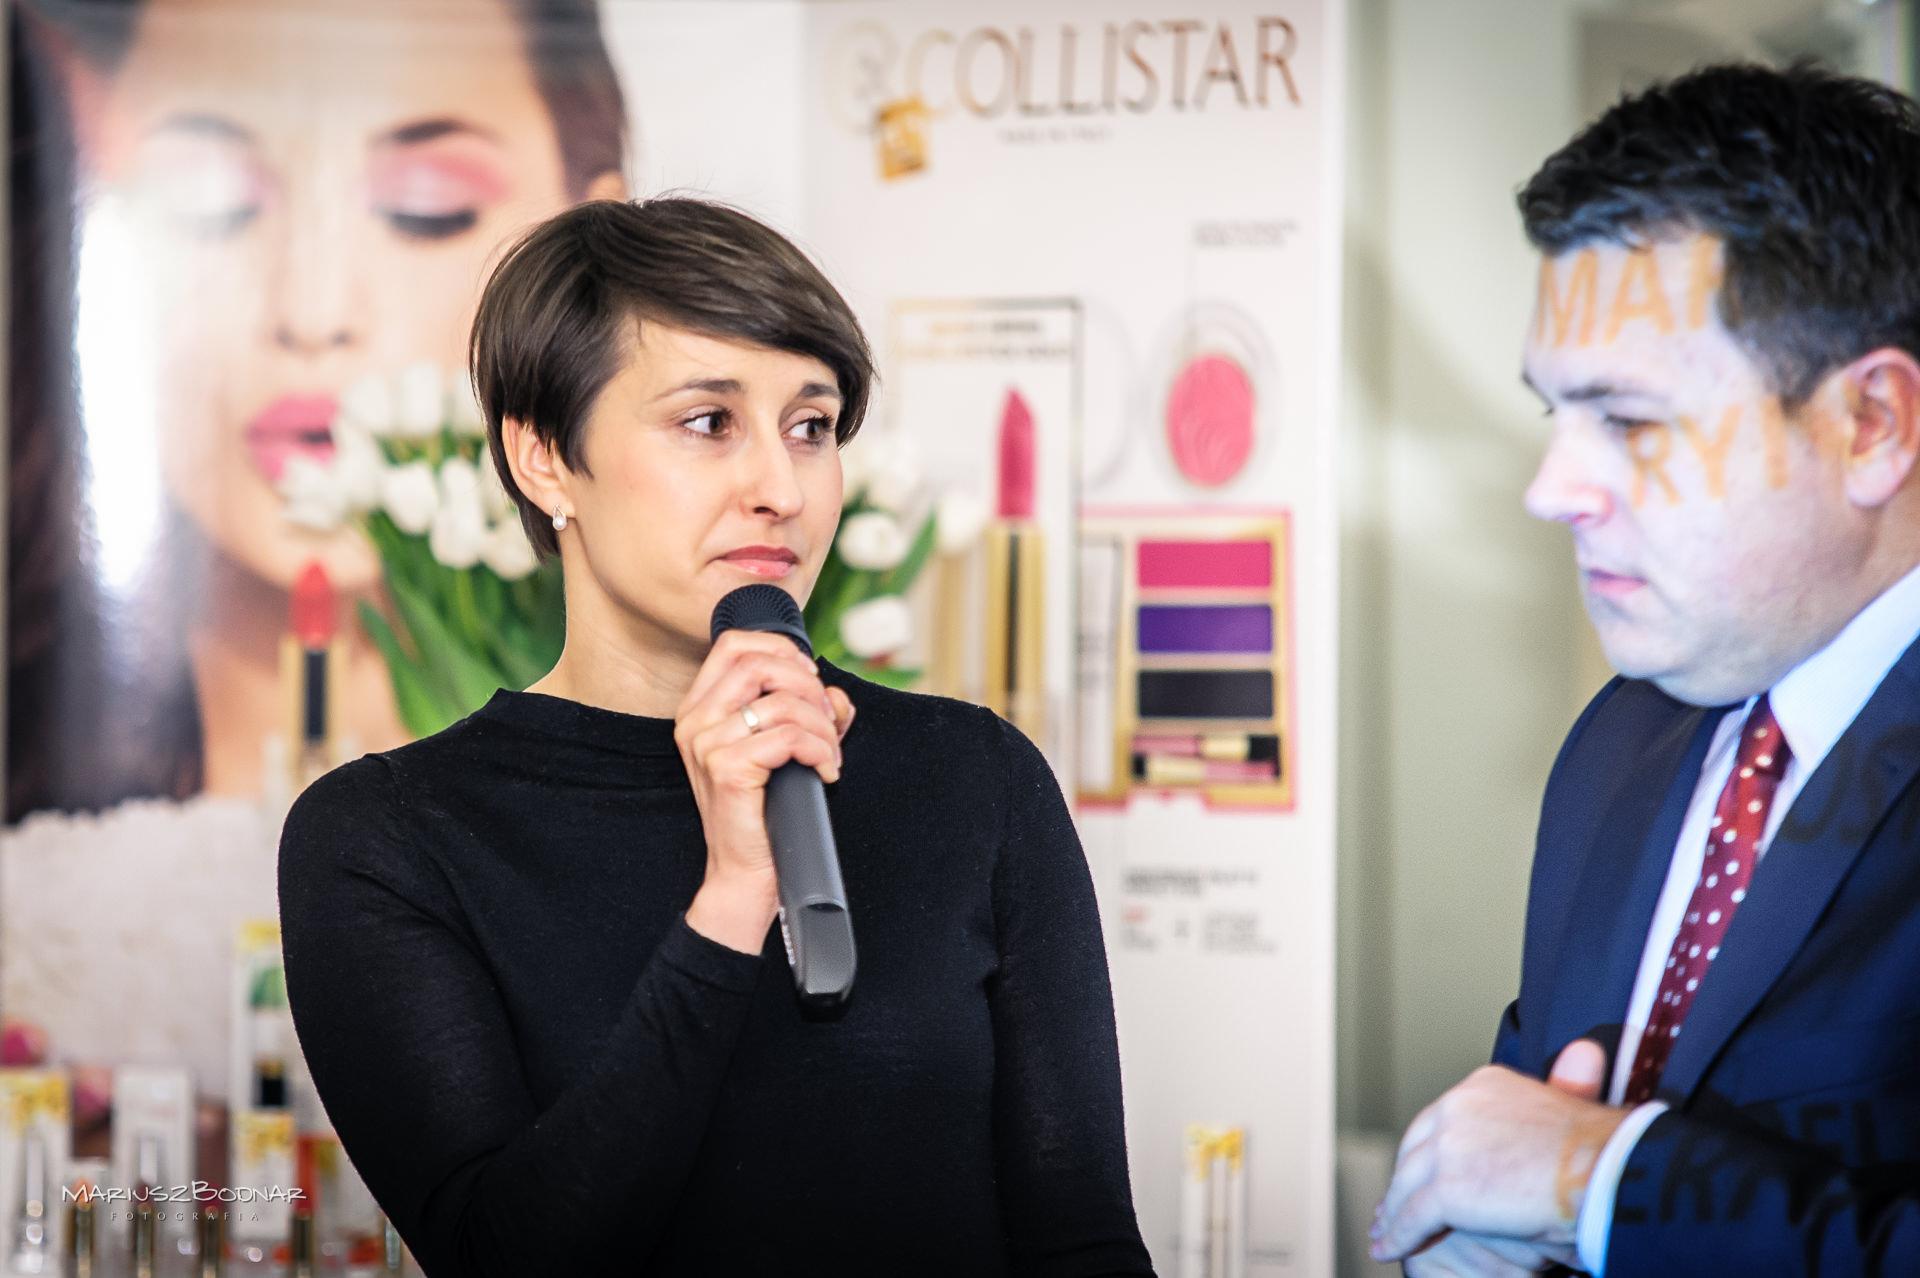 konferencja prasowa marki Collistar